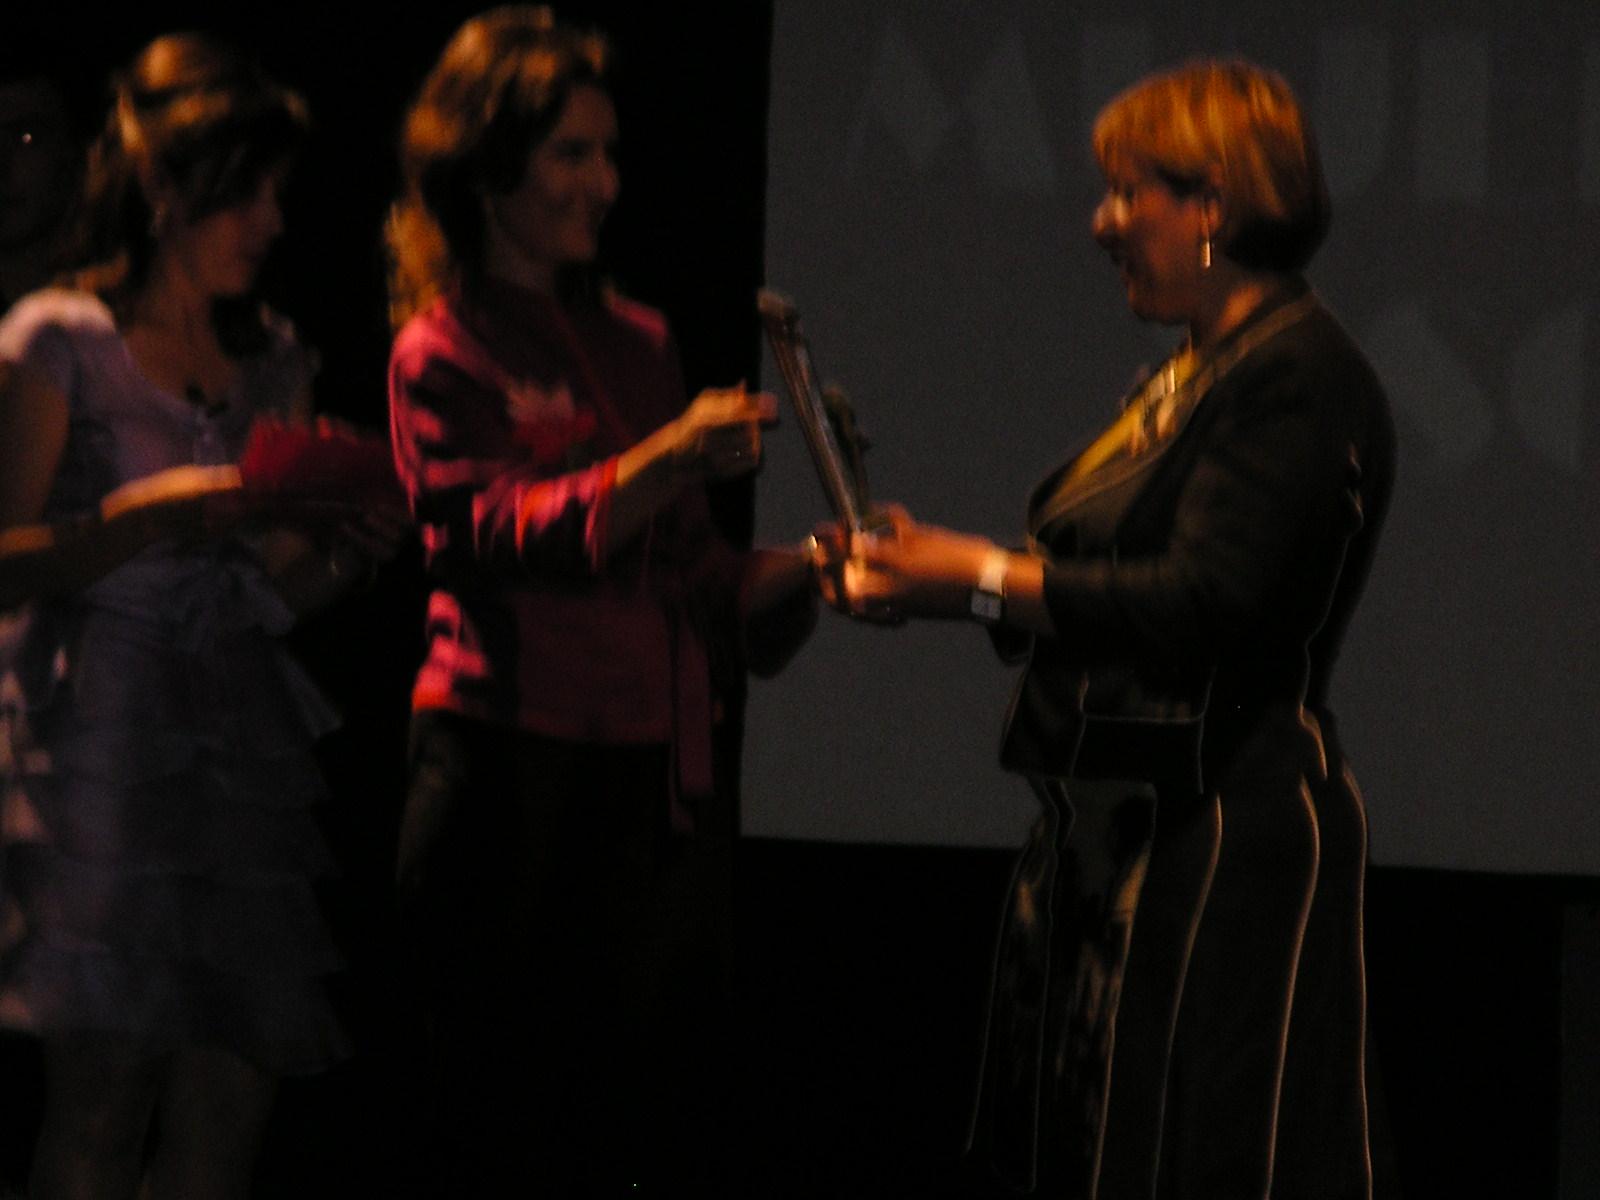 premio-ciudadanas08_12